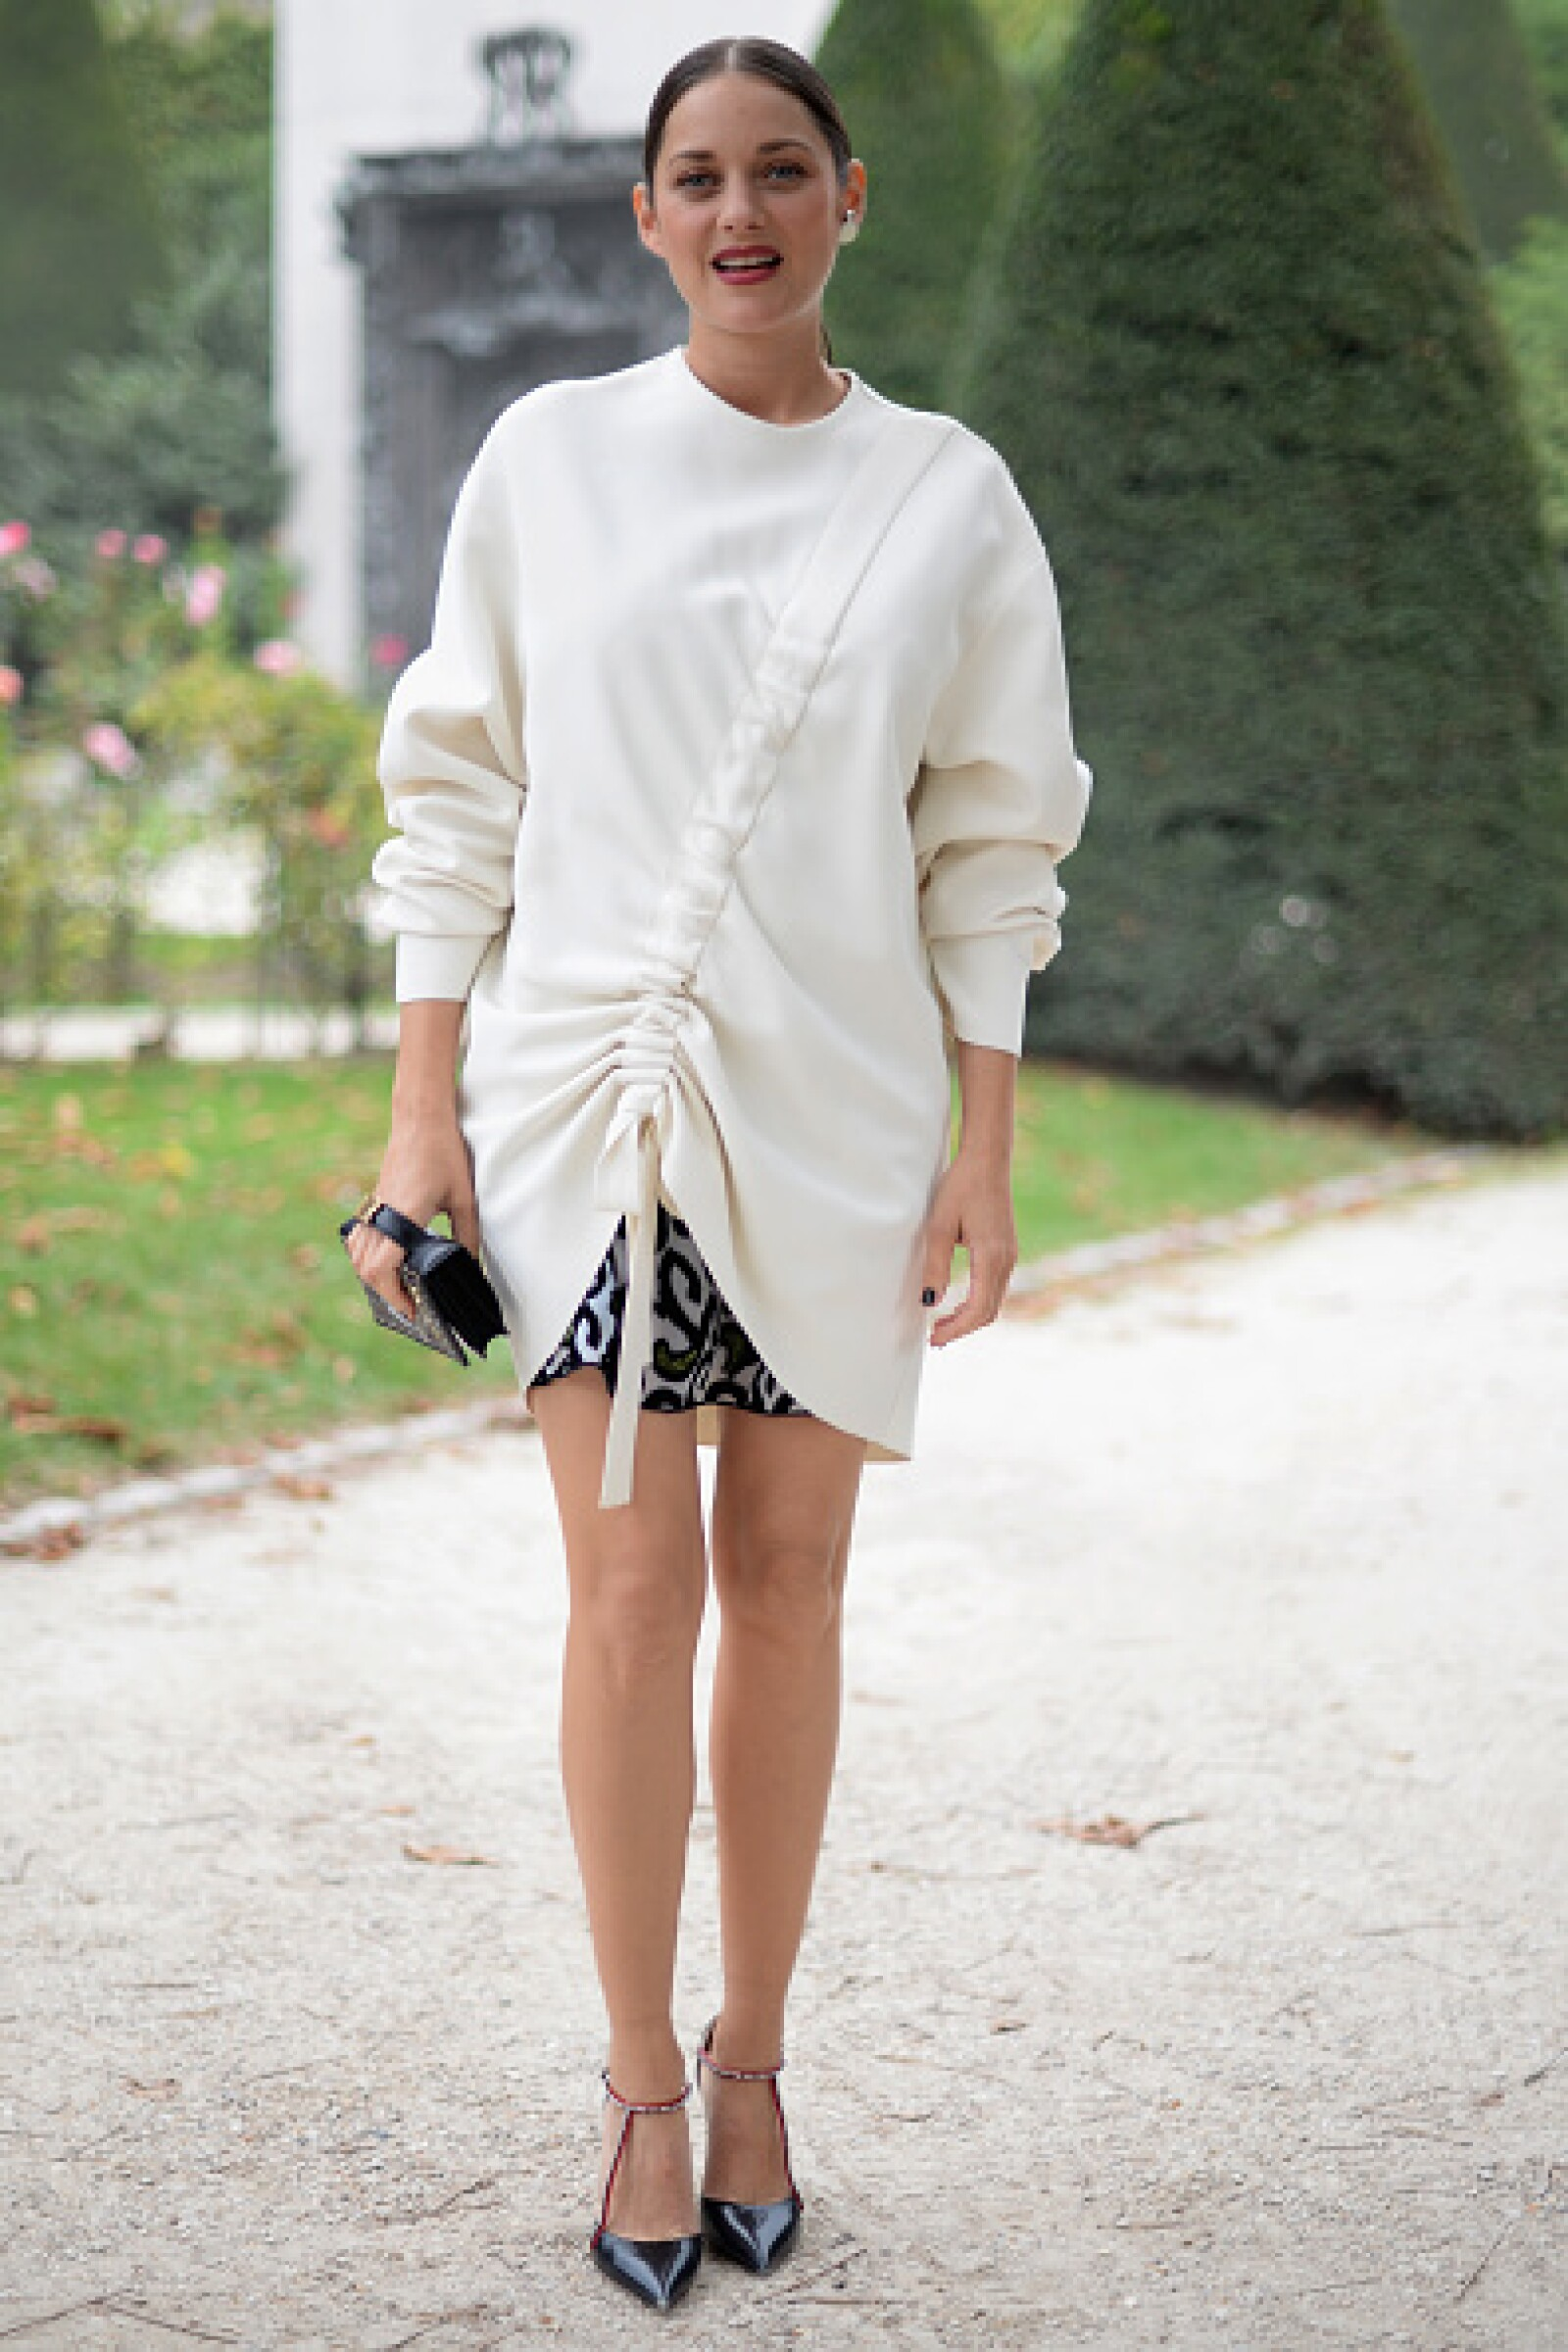 No te olvides de tus faldas esta temporada de frío